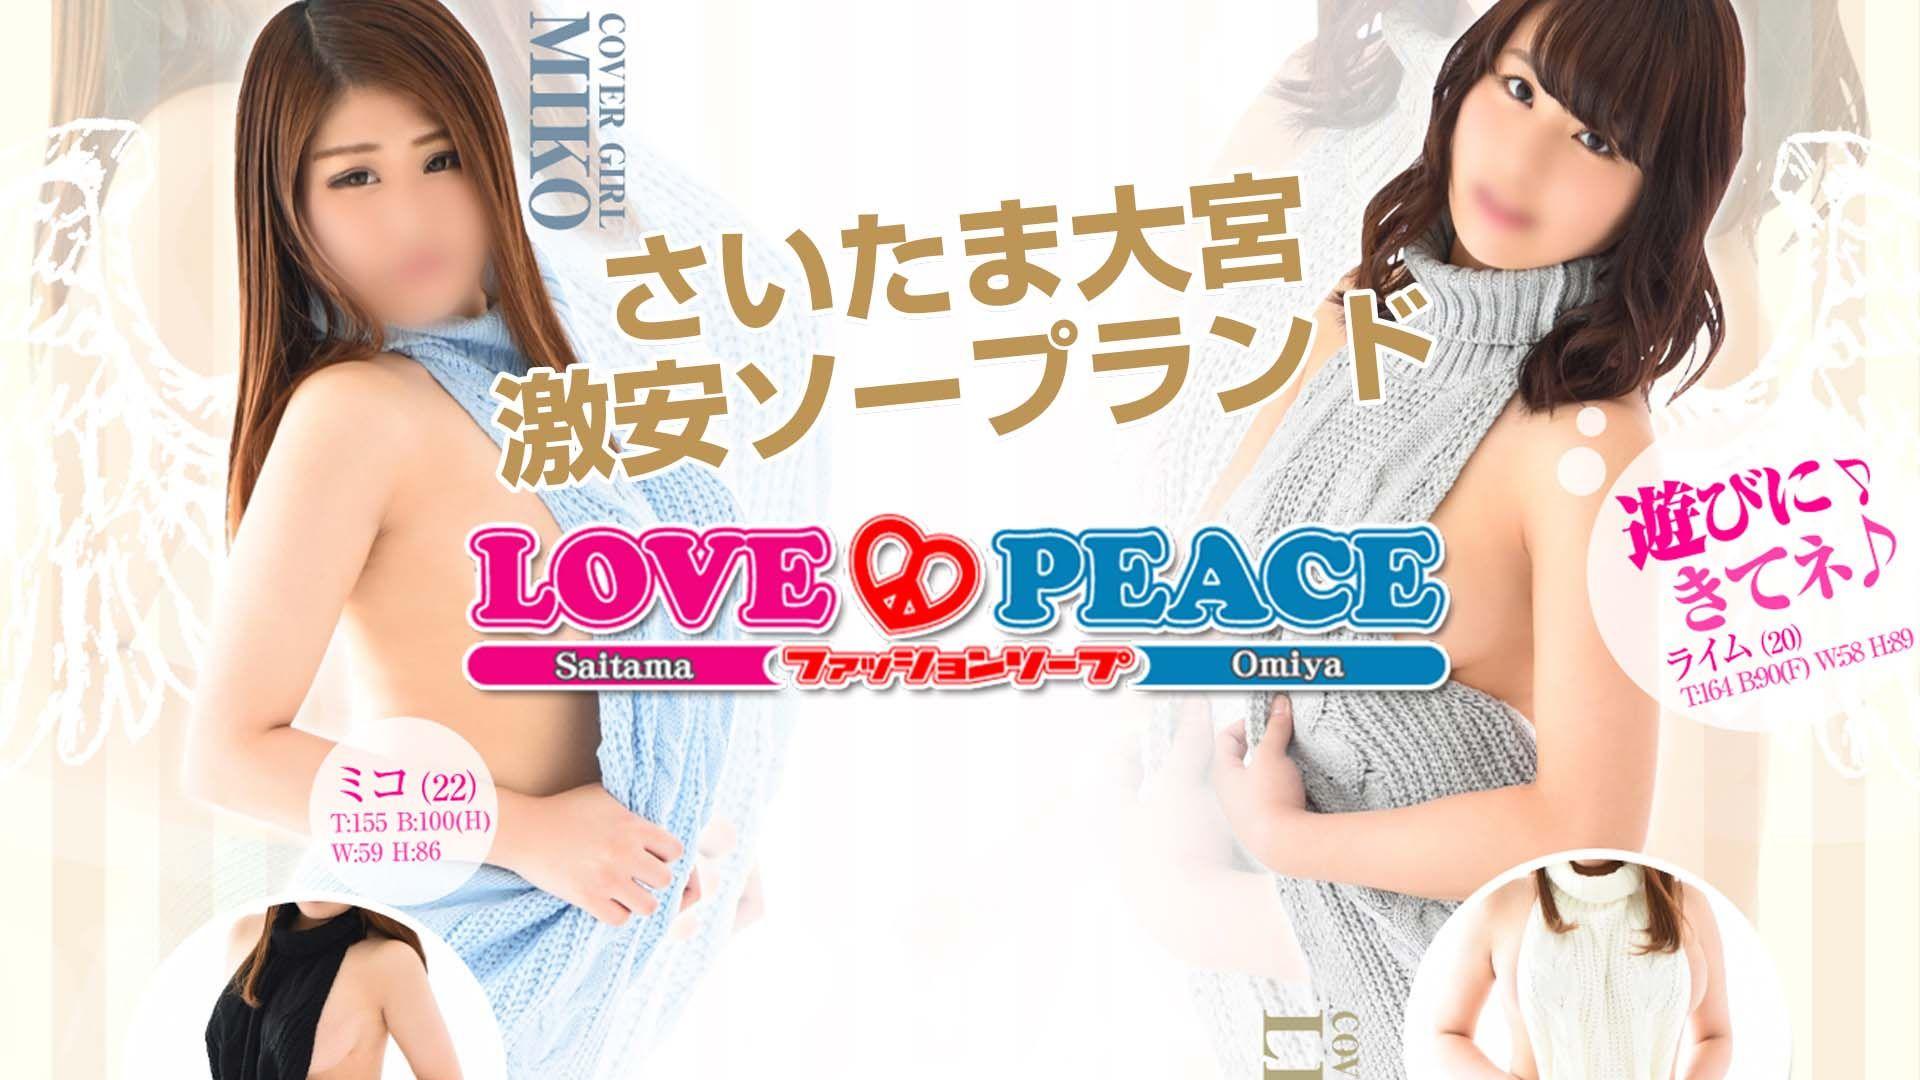 LOVE&PEACE(ラブ&ピース)